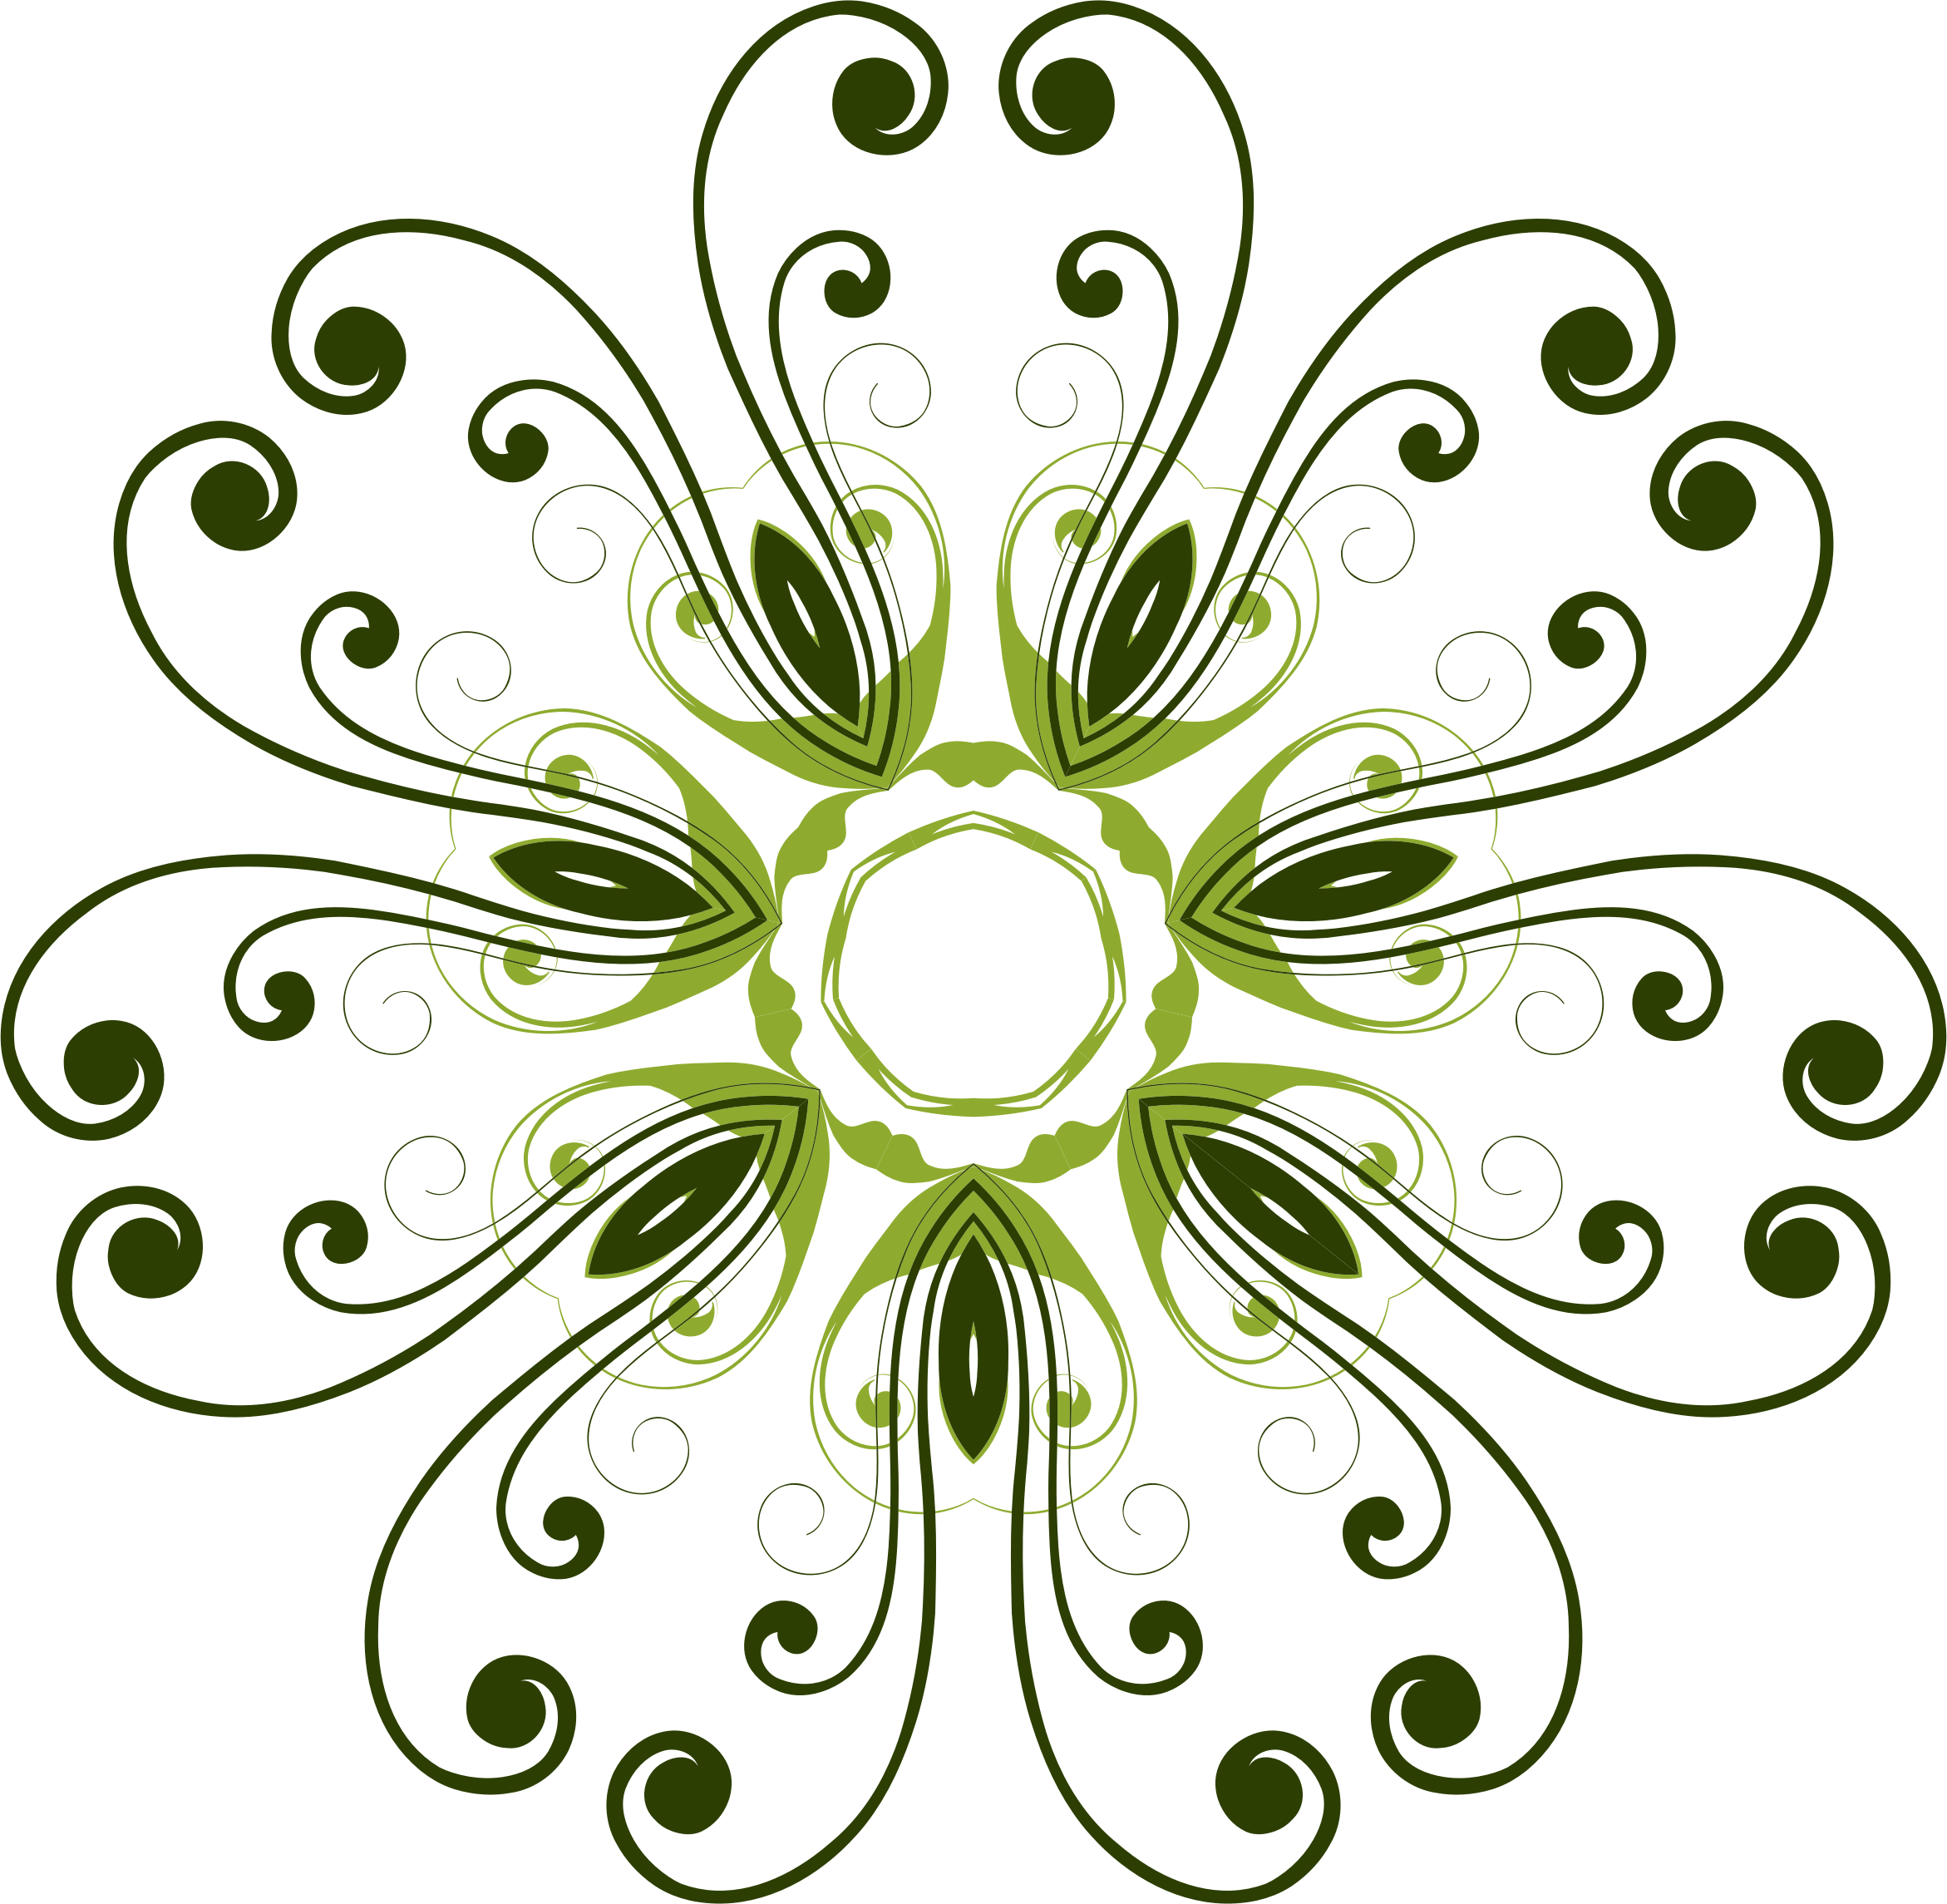 Design big image png. Flower flourish clipart